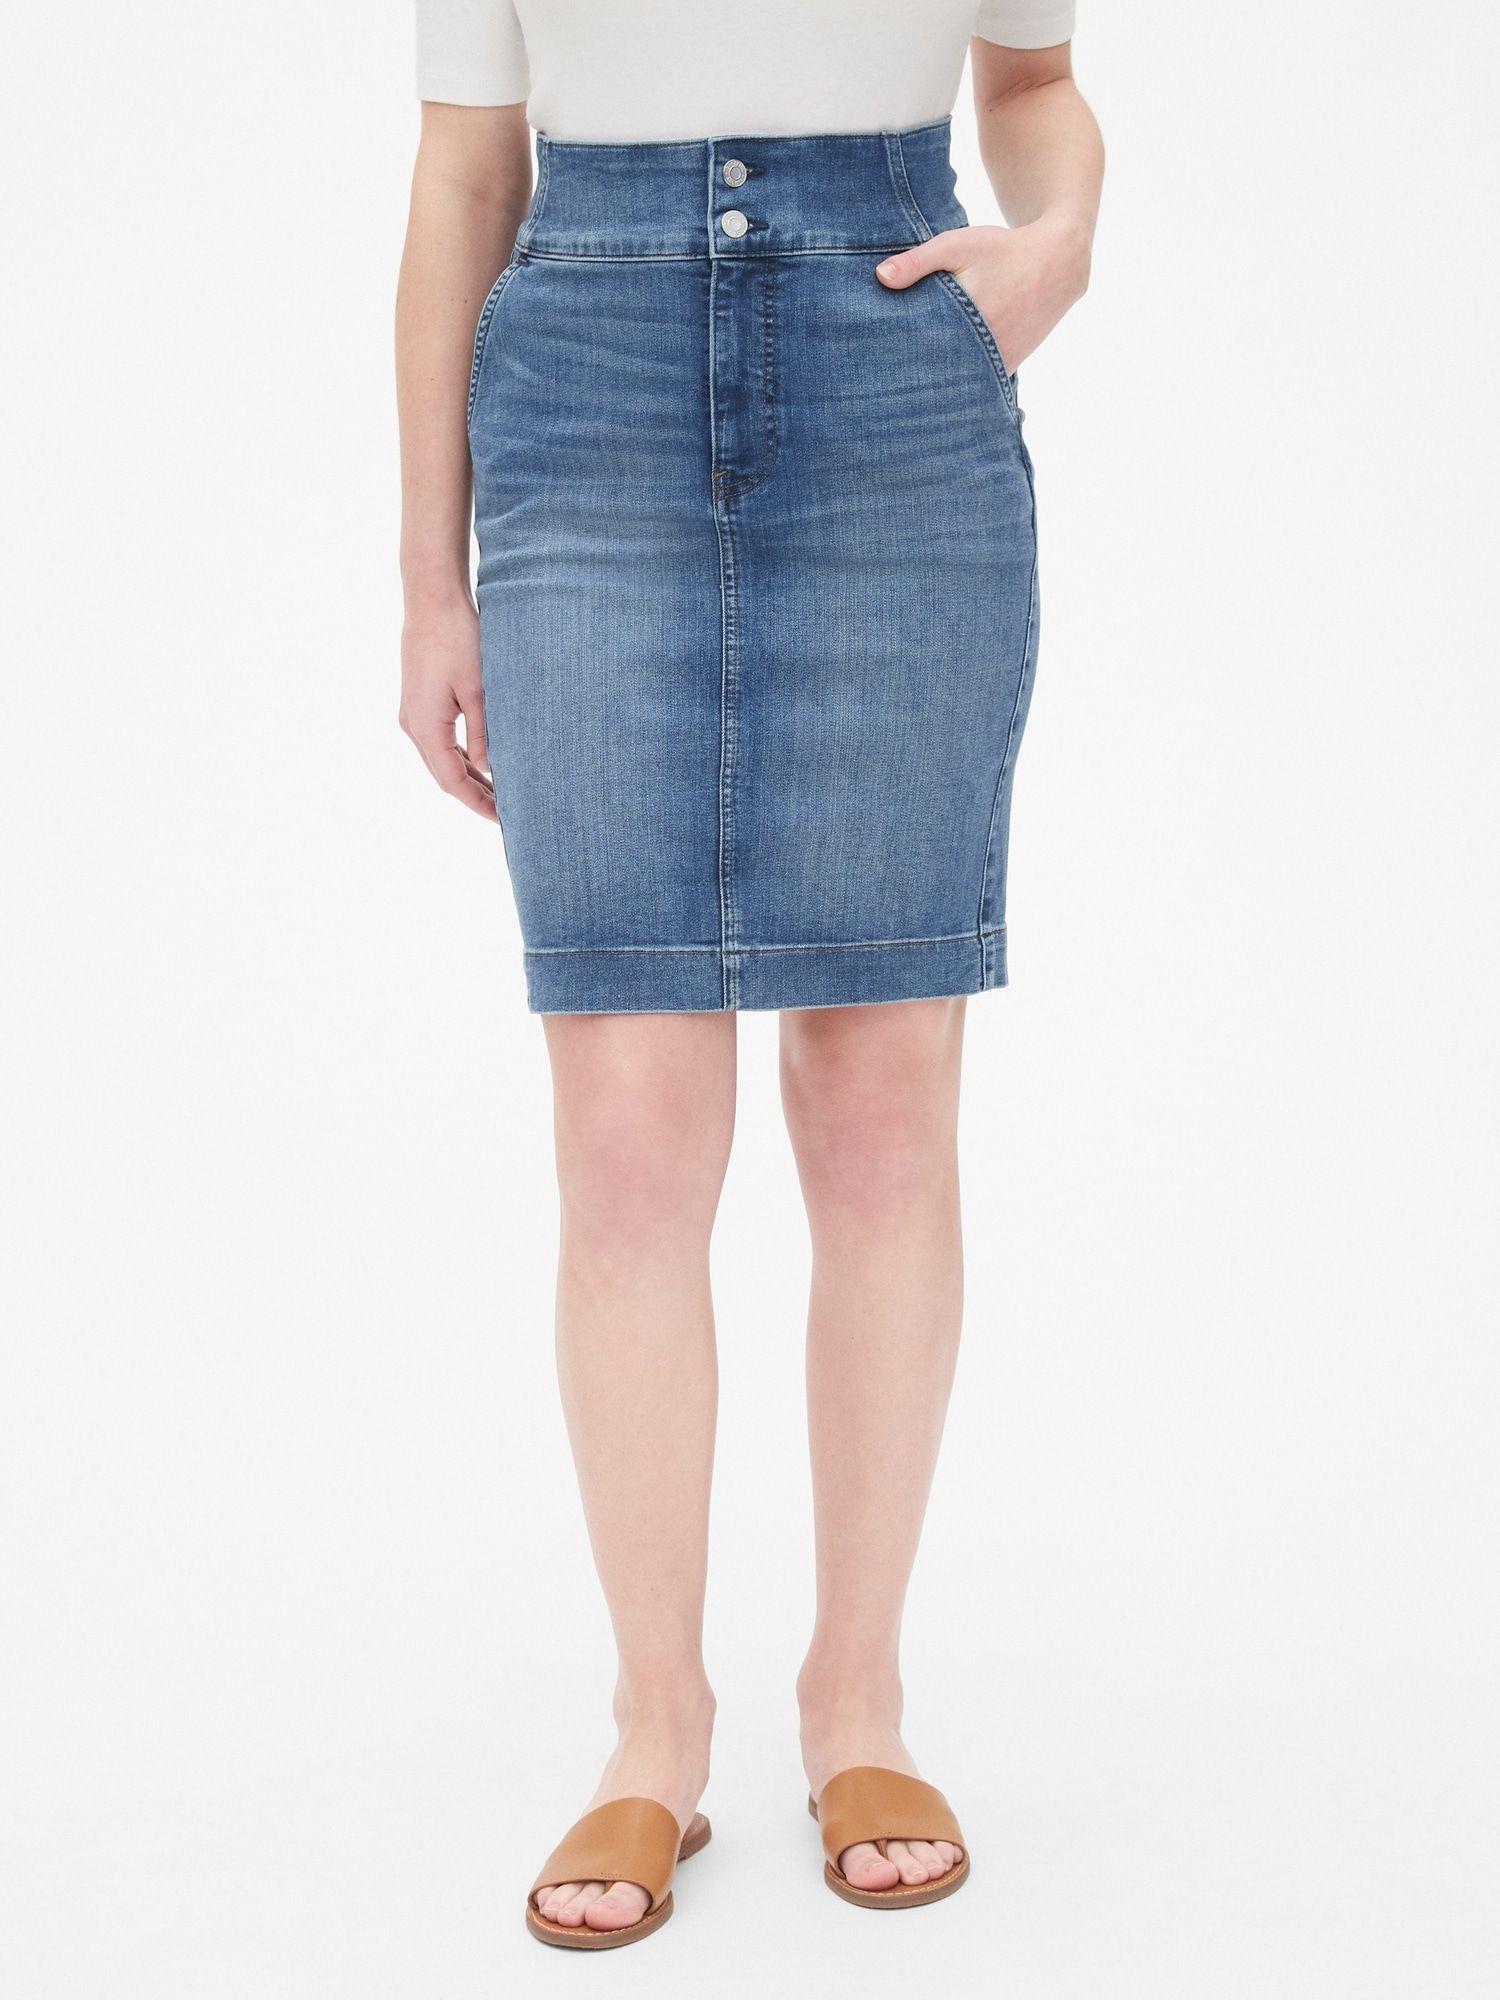 Vintage Gap High Rise Denim Button Up Skirt Size 27